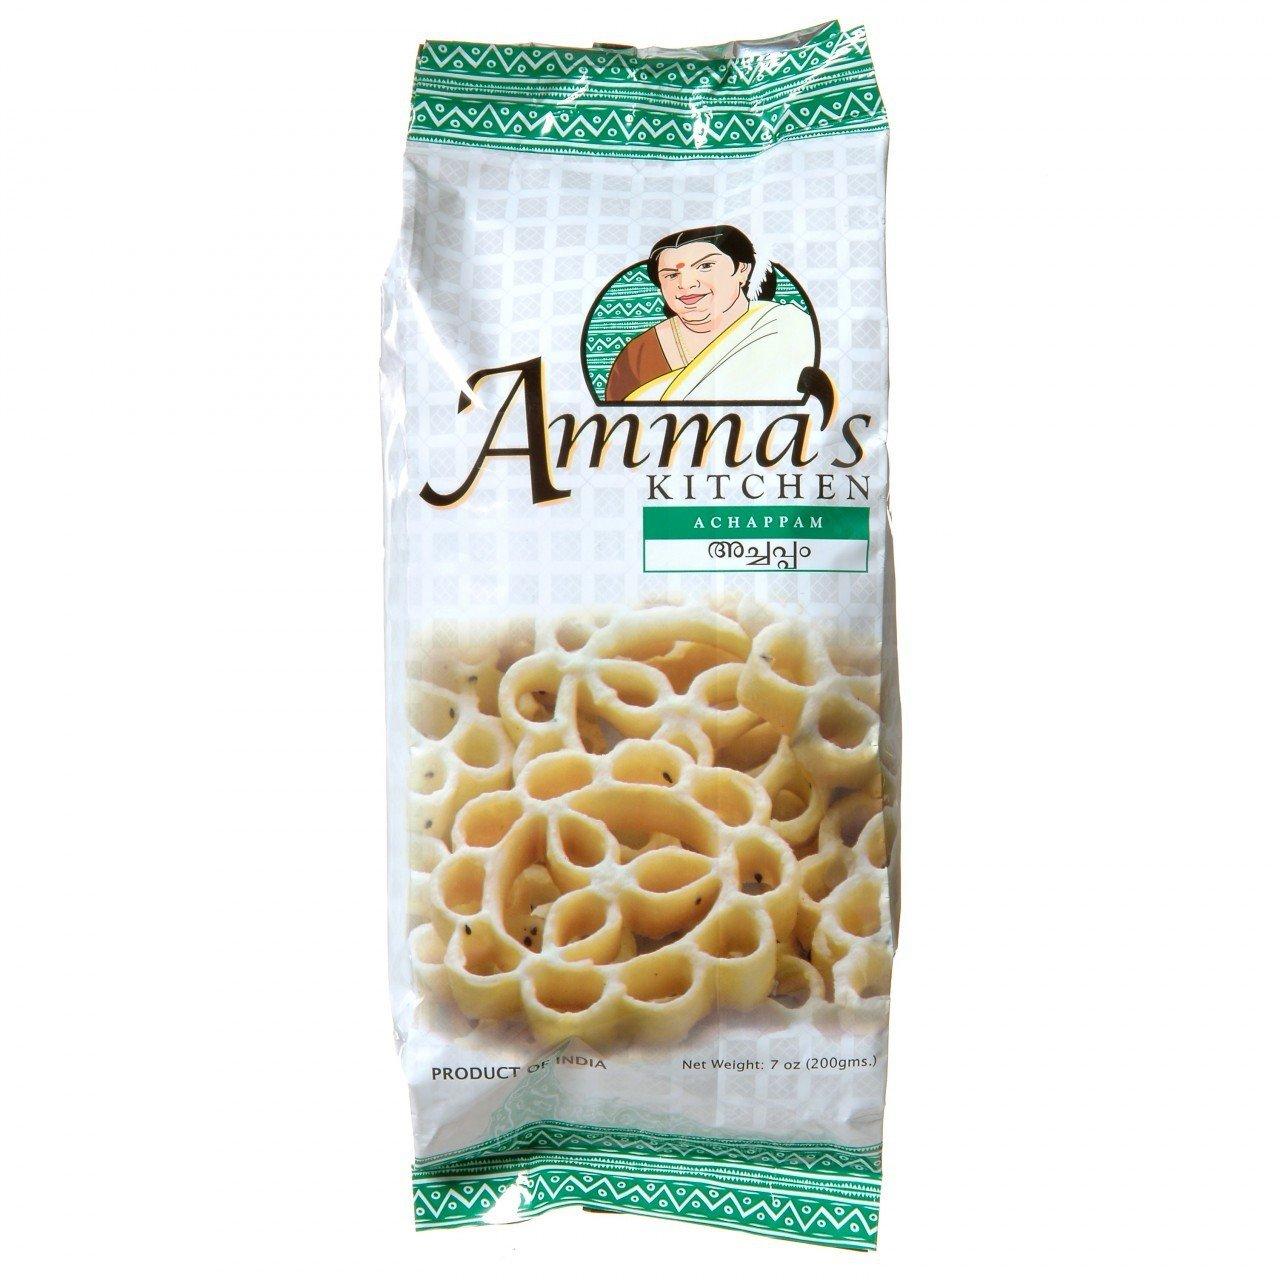 Amazon.com : Amma\'s Kitchen Traditional Achappam - Indian Rose ...